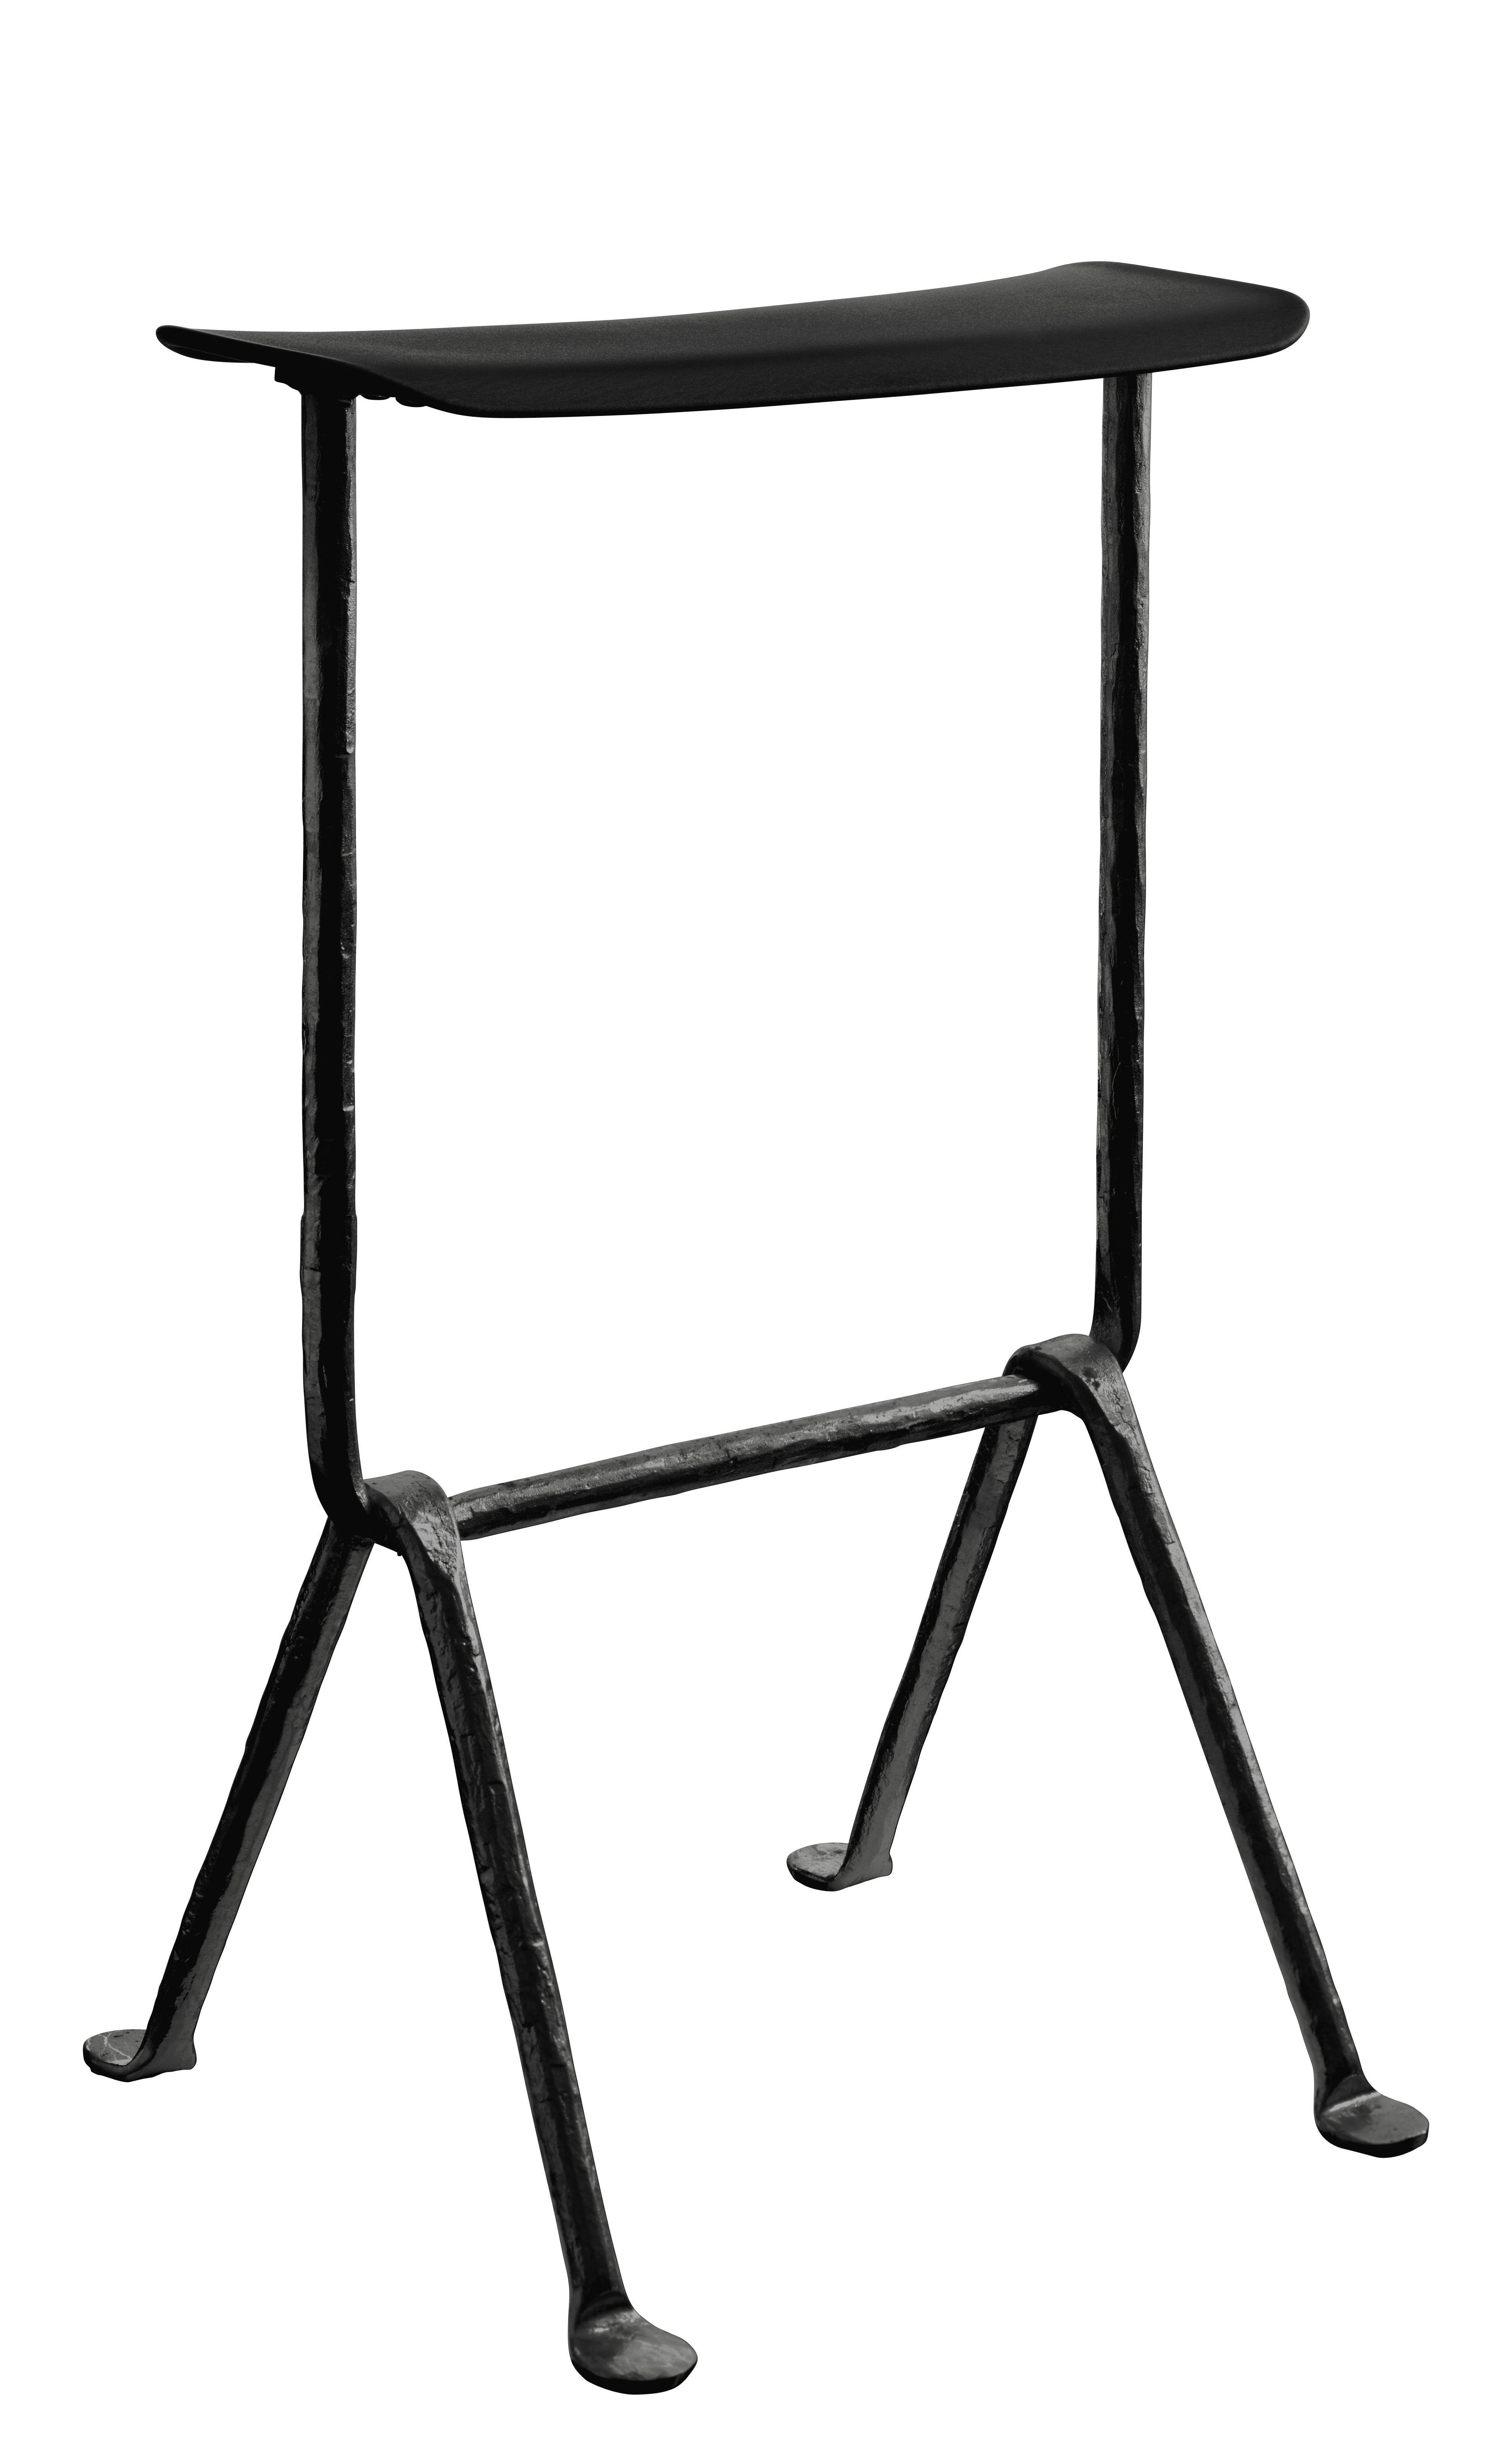 Möbel - Barhocker - Officina Barhocker / Polypropylen - H 65 cm - Magis - Schwarz / Gestell schwarz - Polypropylen, Schmiedearbeit